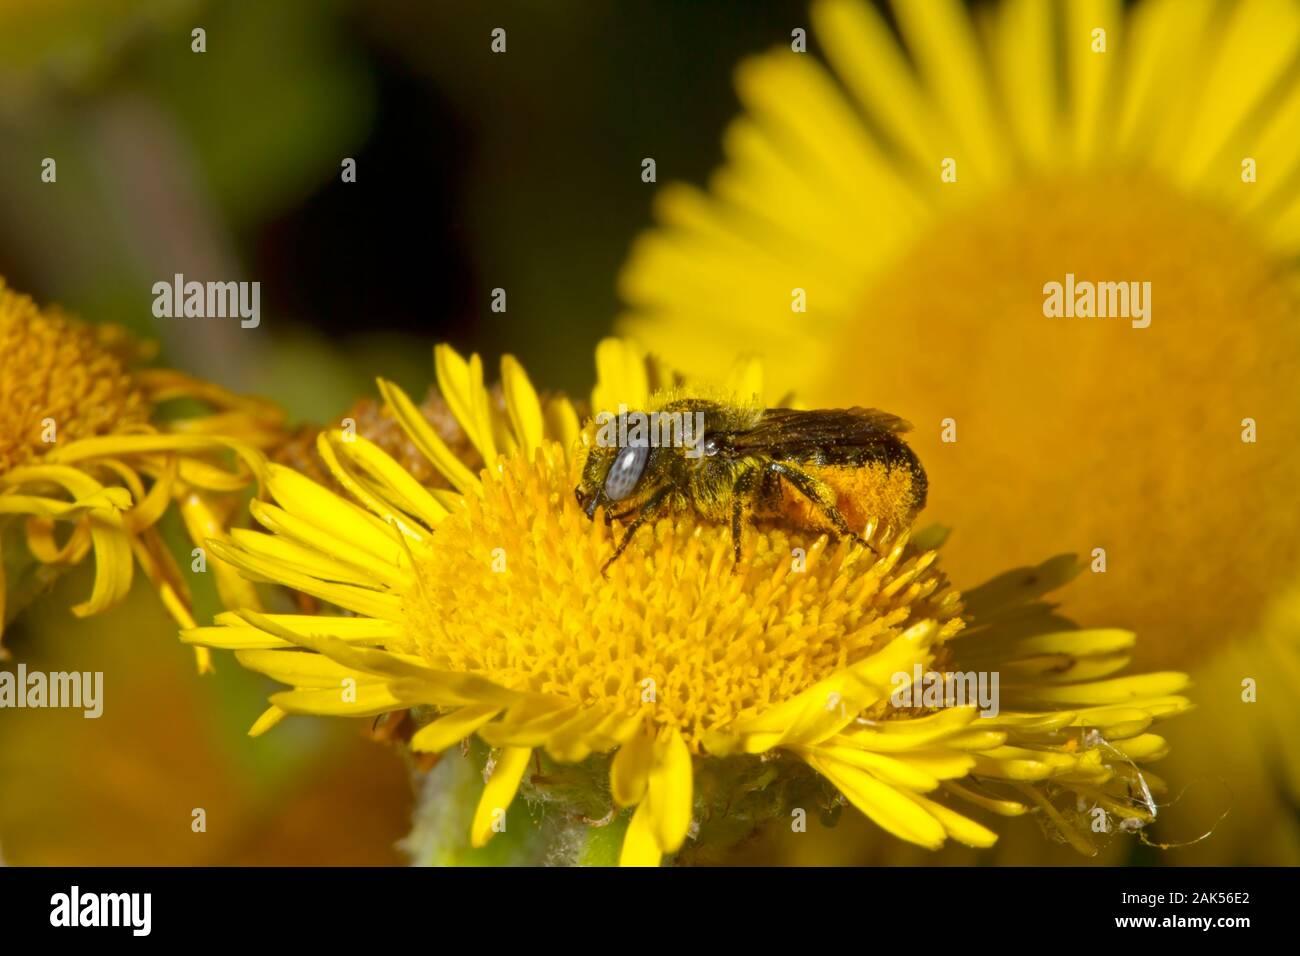 Spined Maurer - Biene - Osmia spinulosa Stockfoto